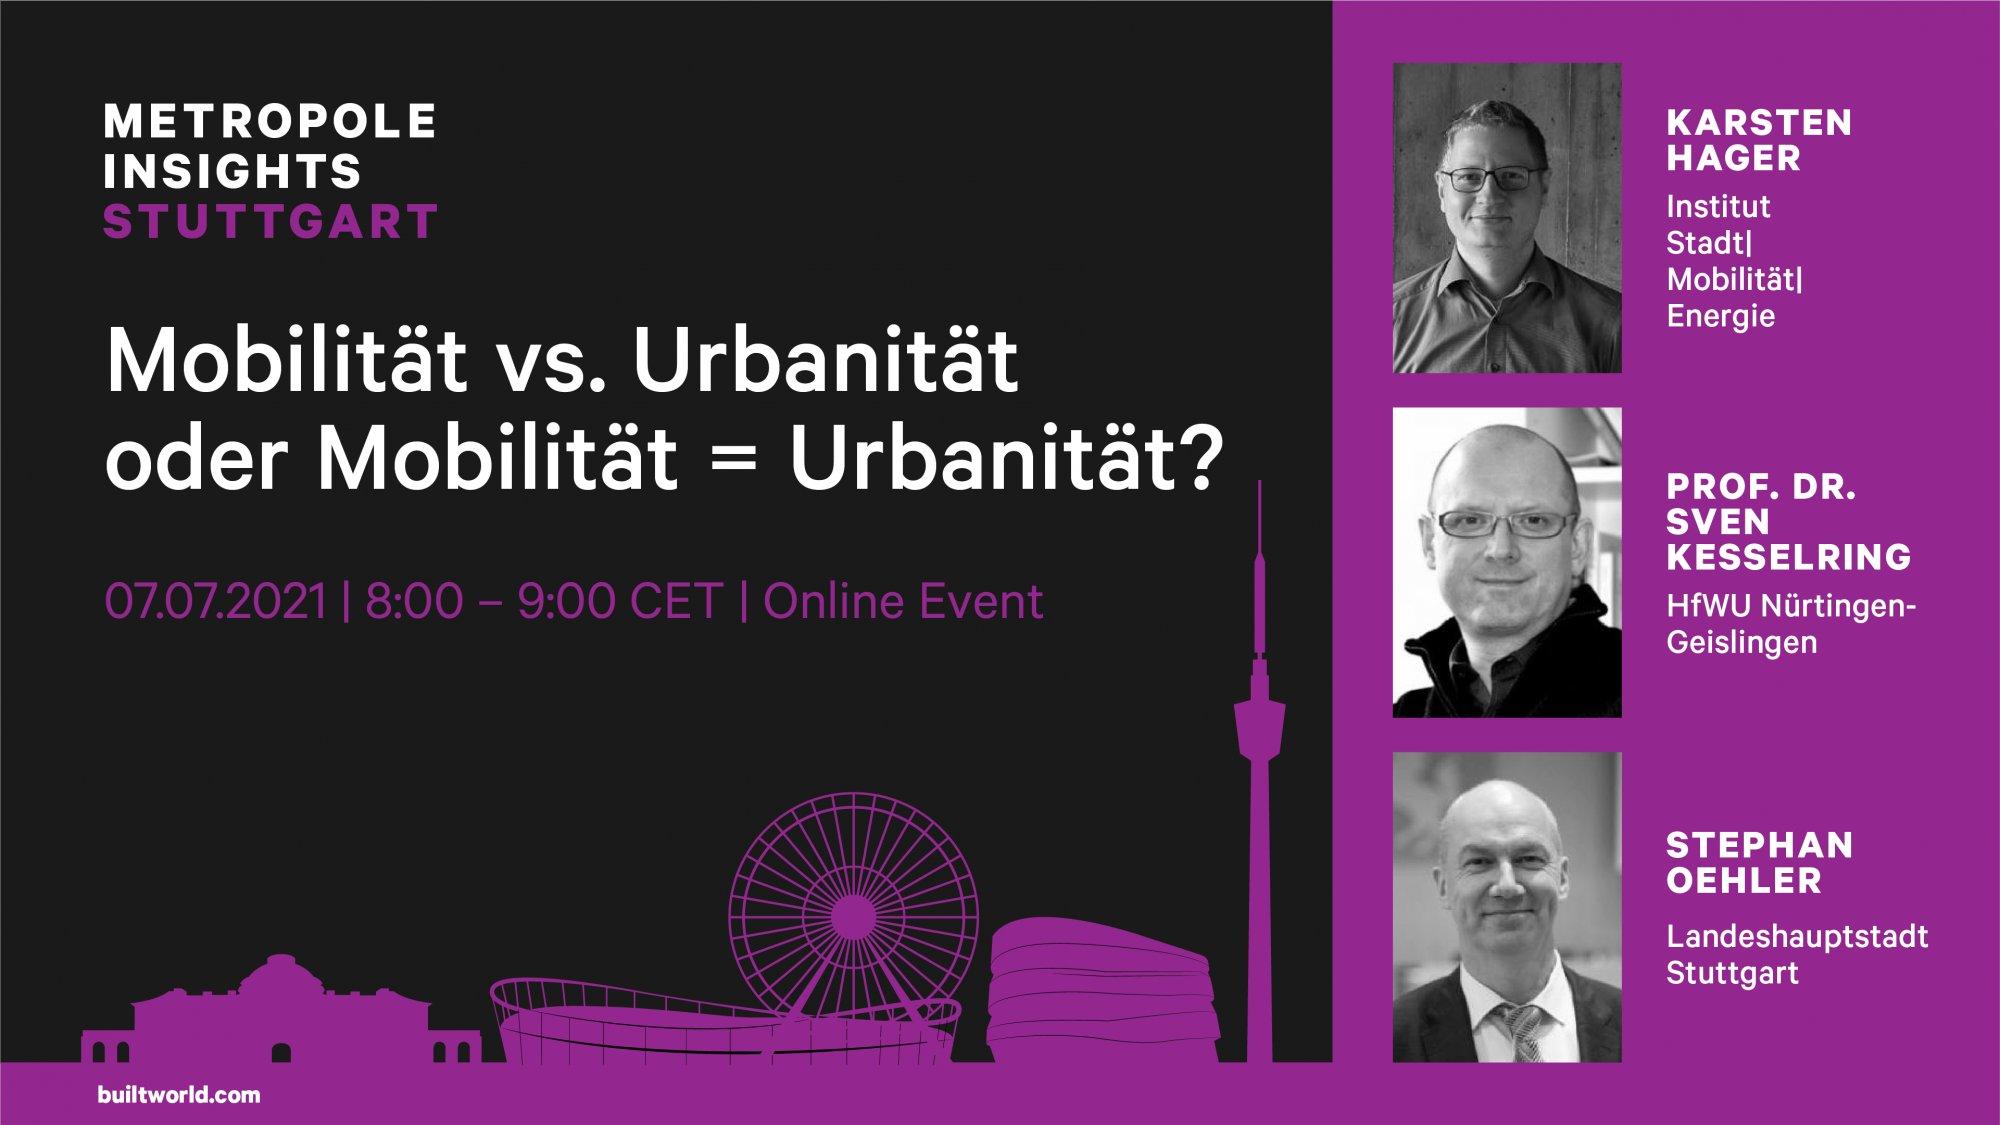 metropole-insights-stuttgart-mobilitaet-urbanitaet